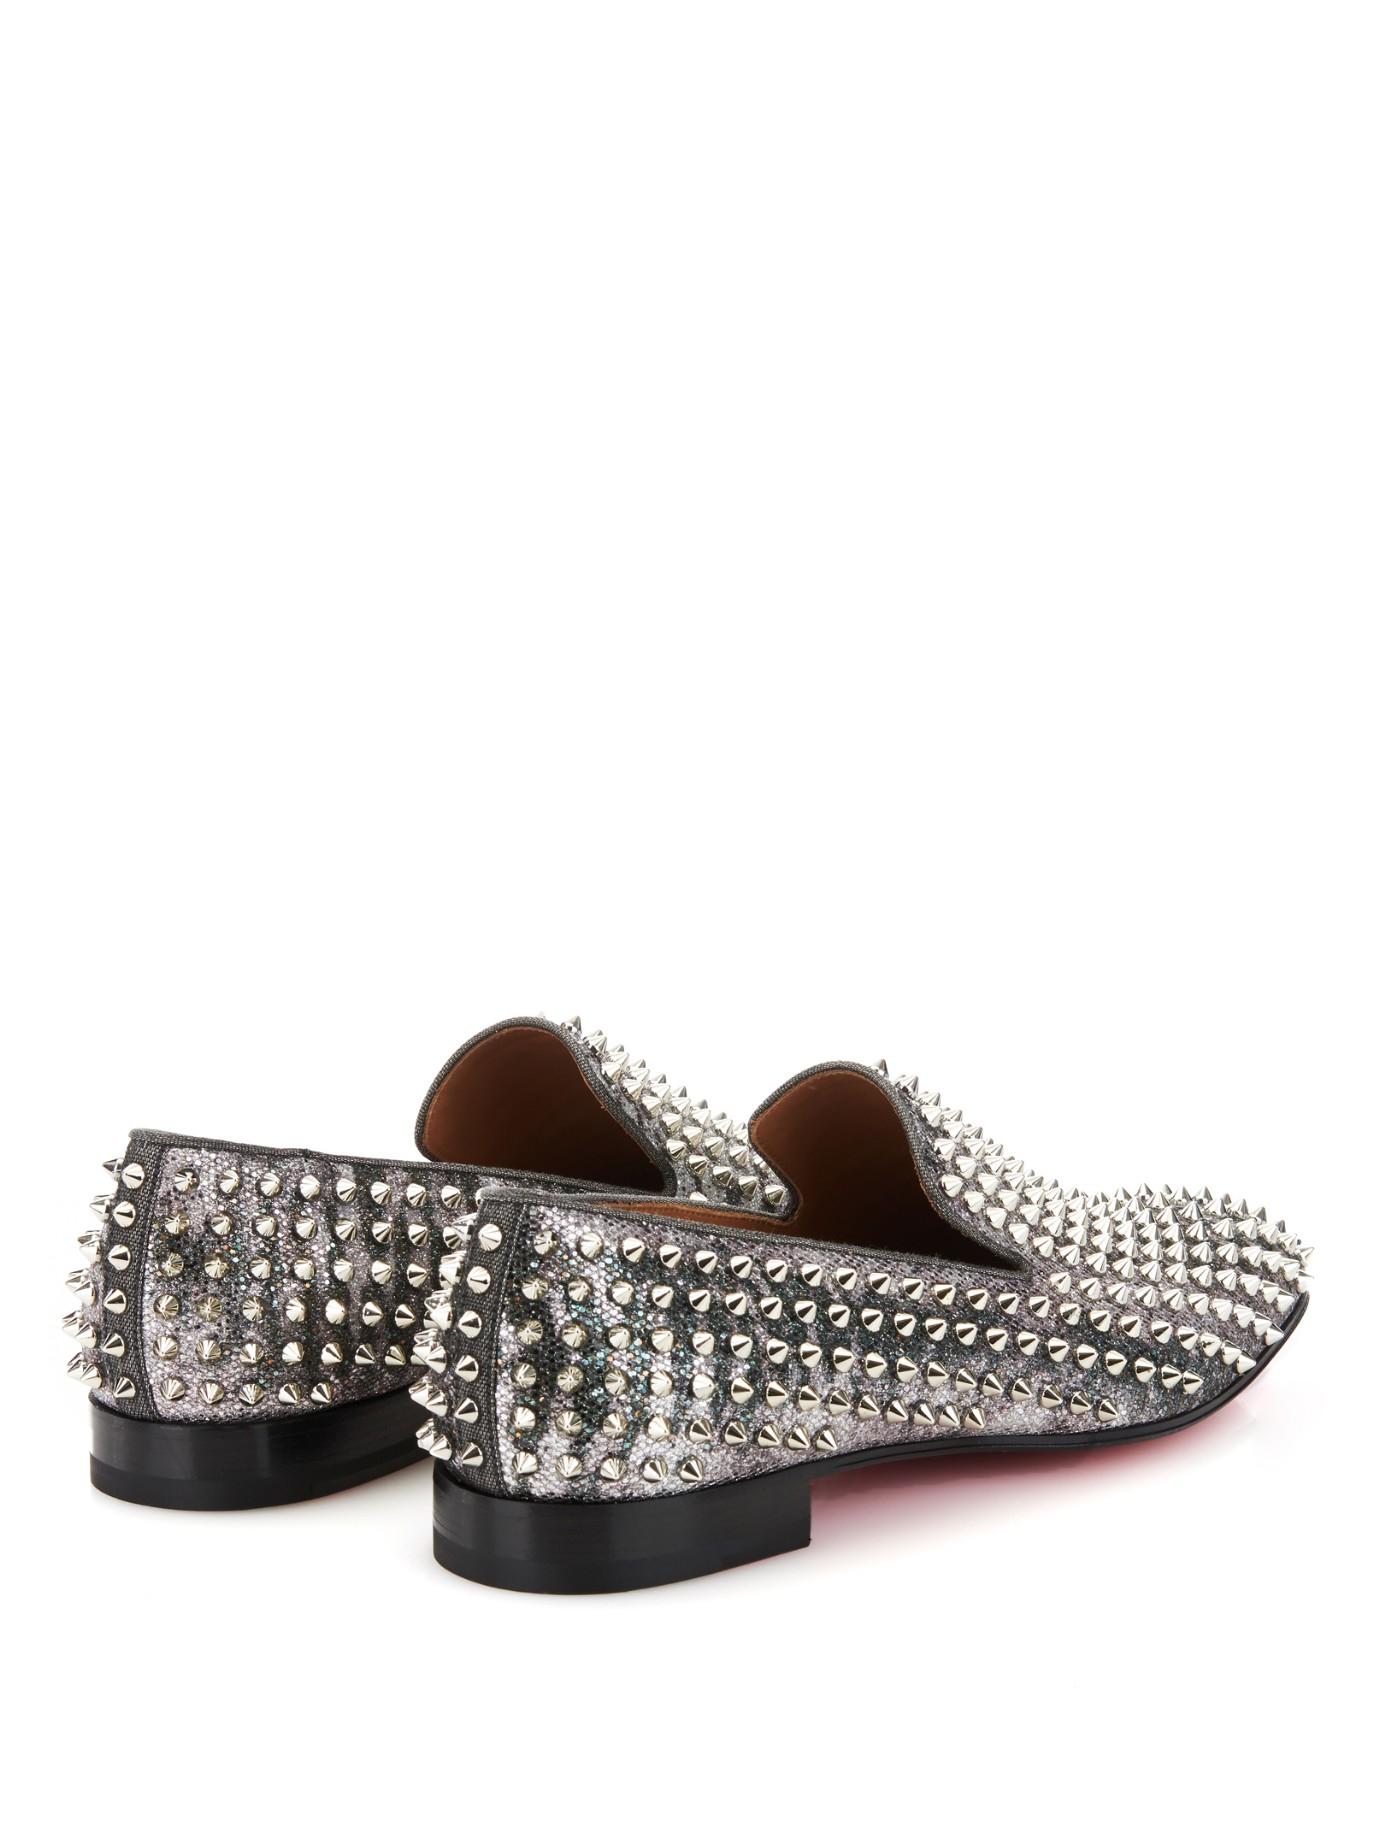 Christian louboutin Dandelion Studded Glitter Loafers in Silver ...